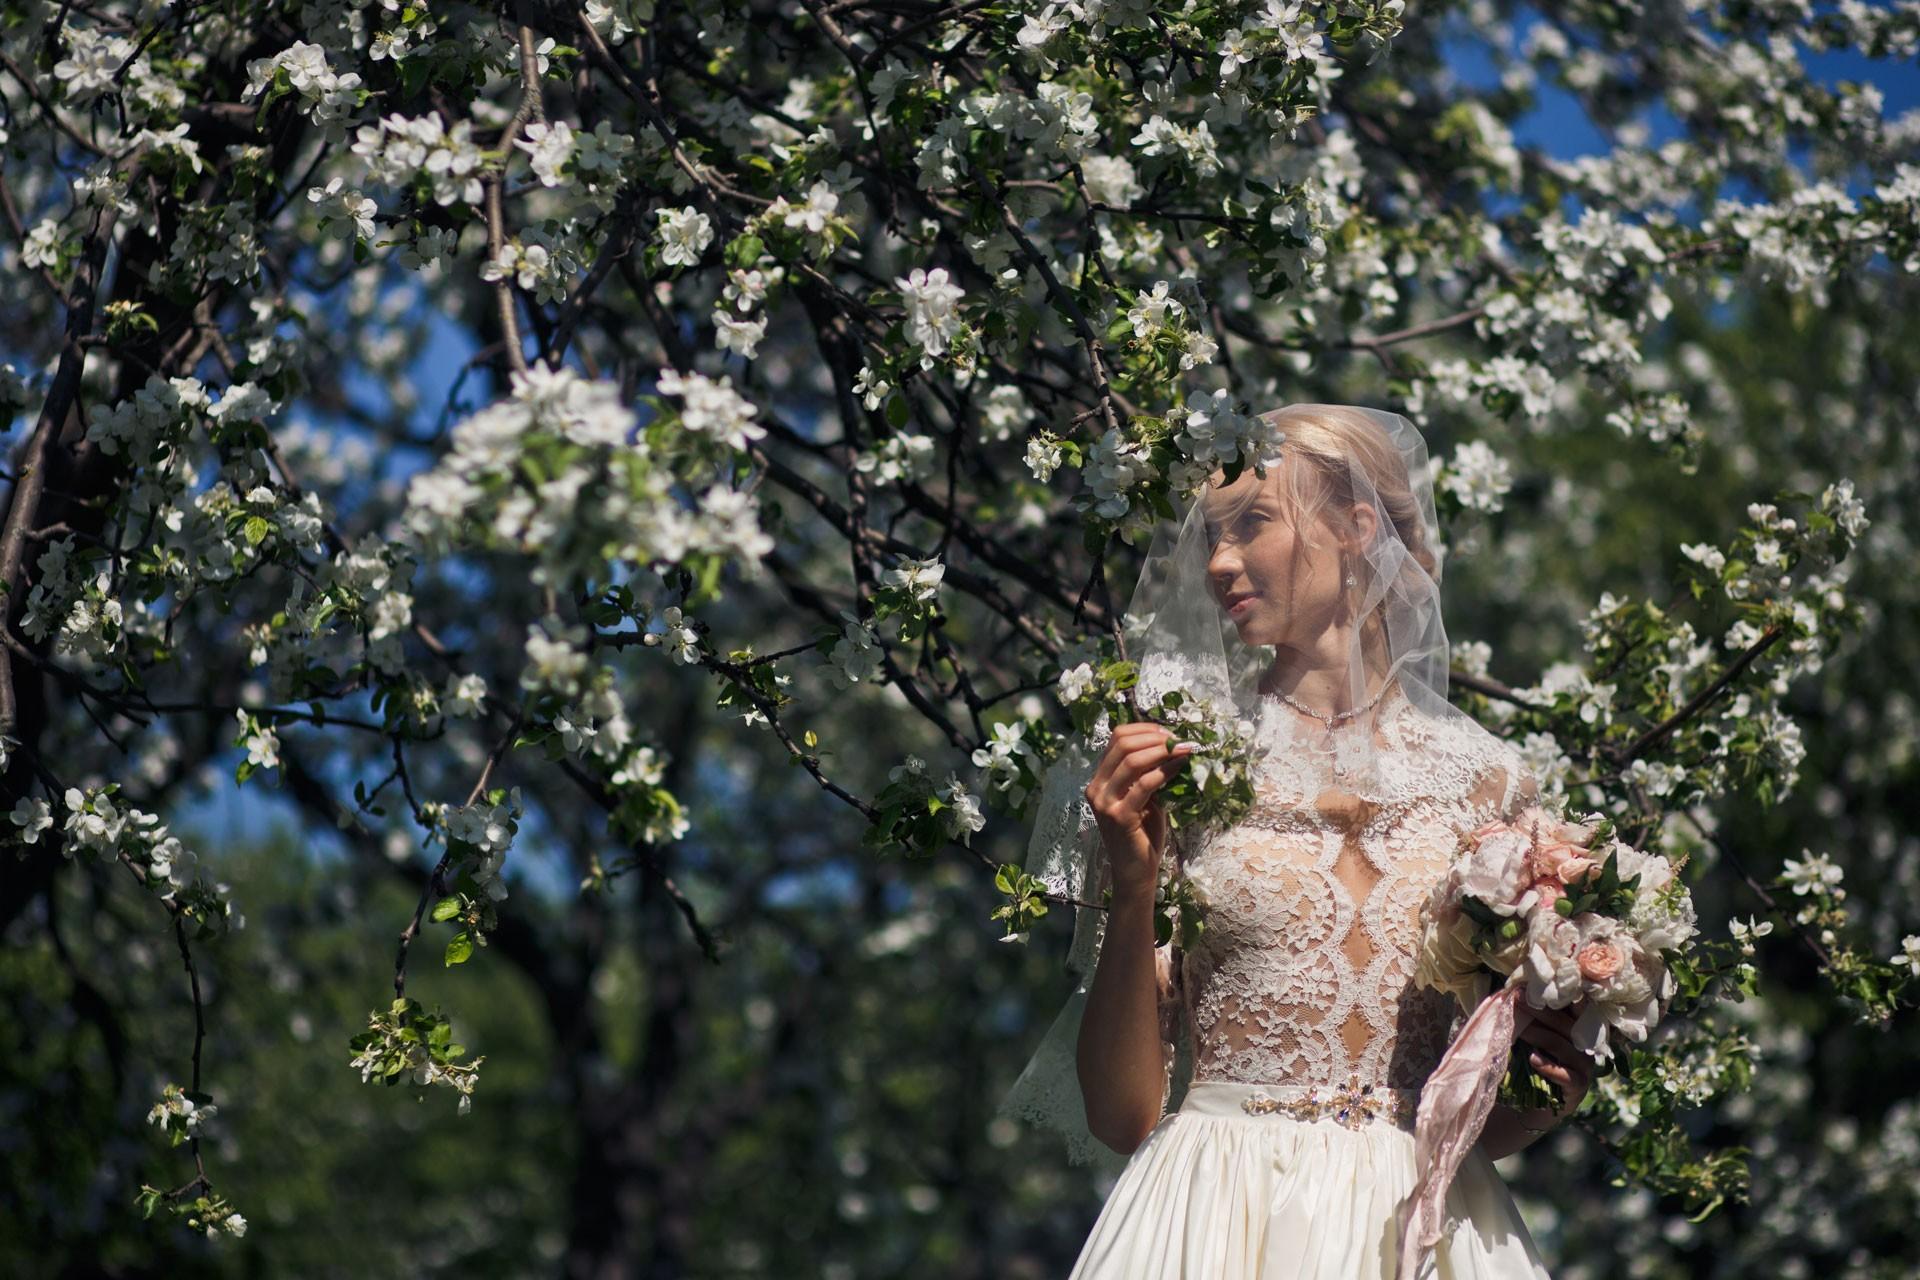 Вишневый сад. Свадьба Валентина Кротова и Натальи Ходуновой фото 11